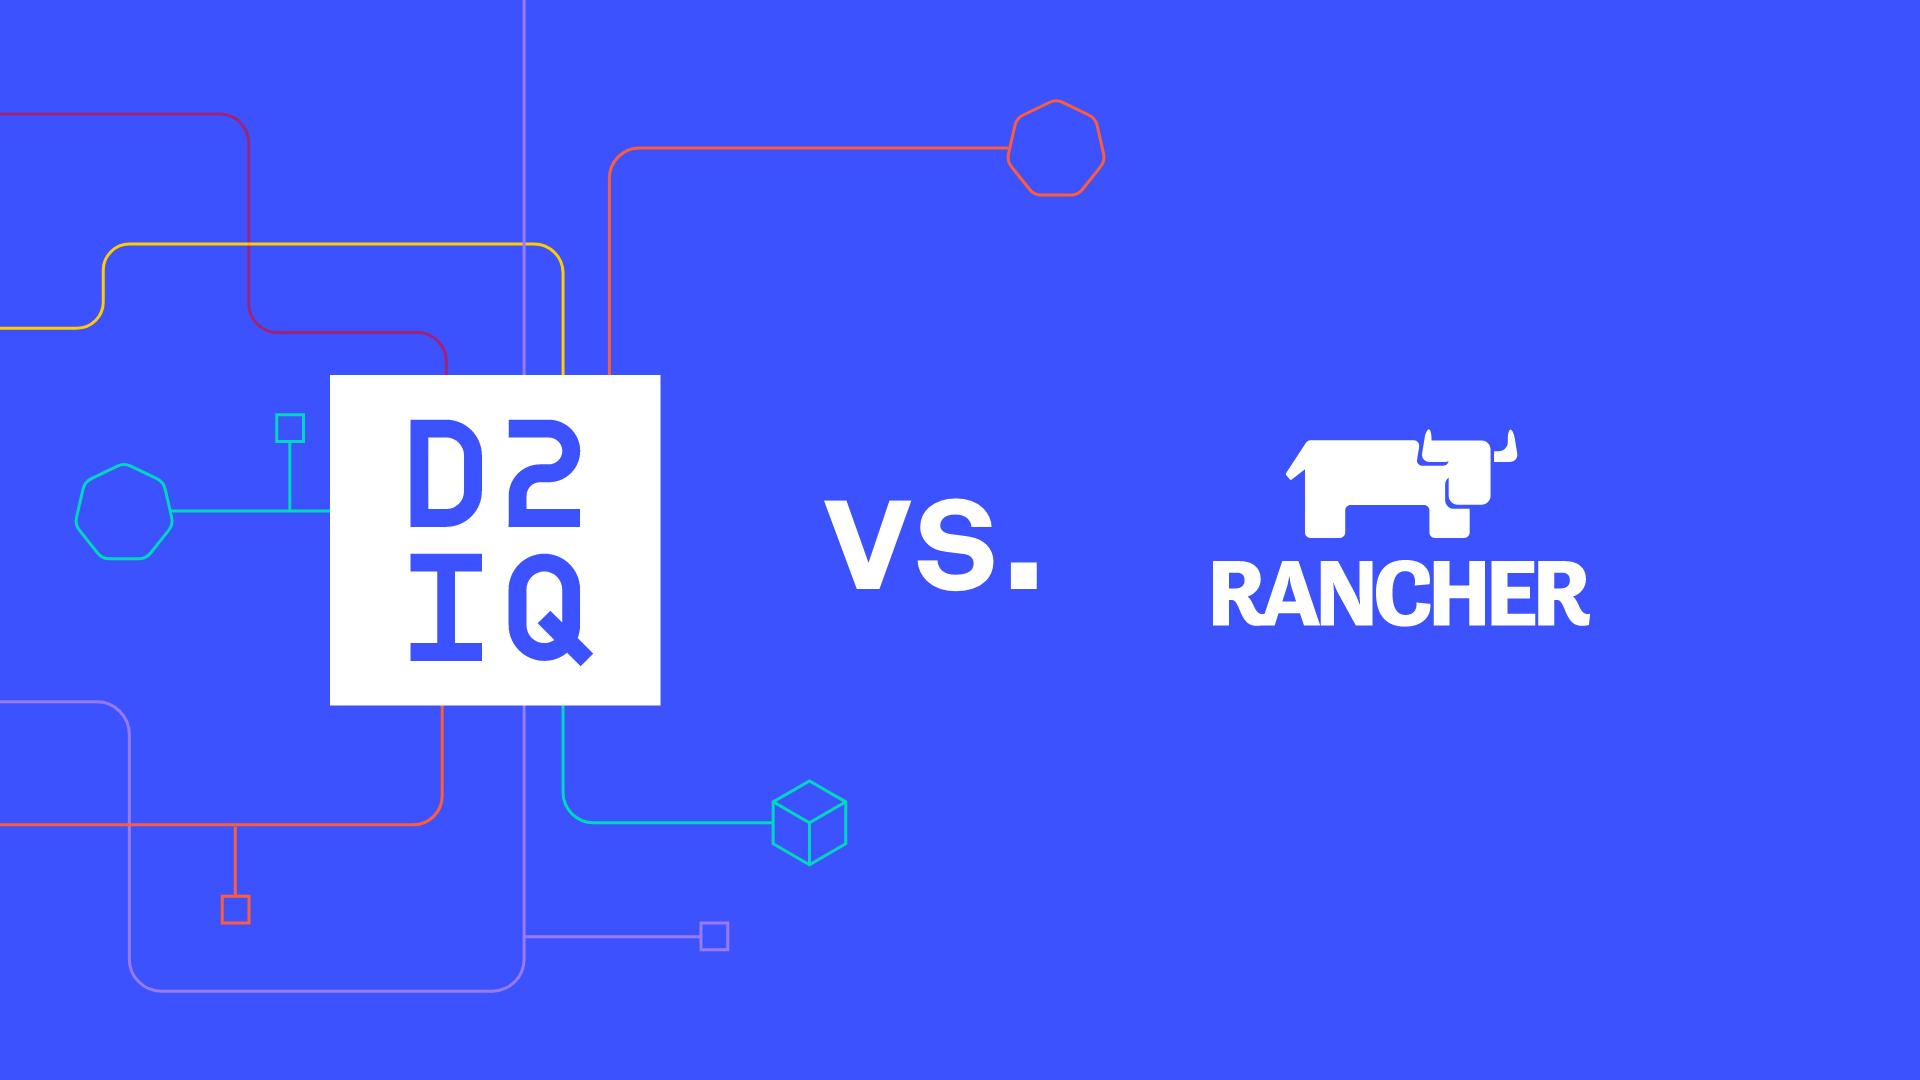 Rancher vs. D2iQ